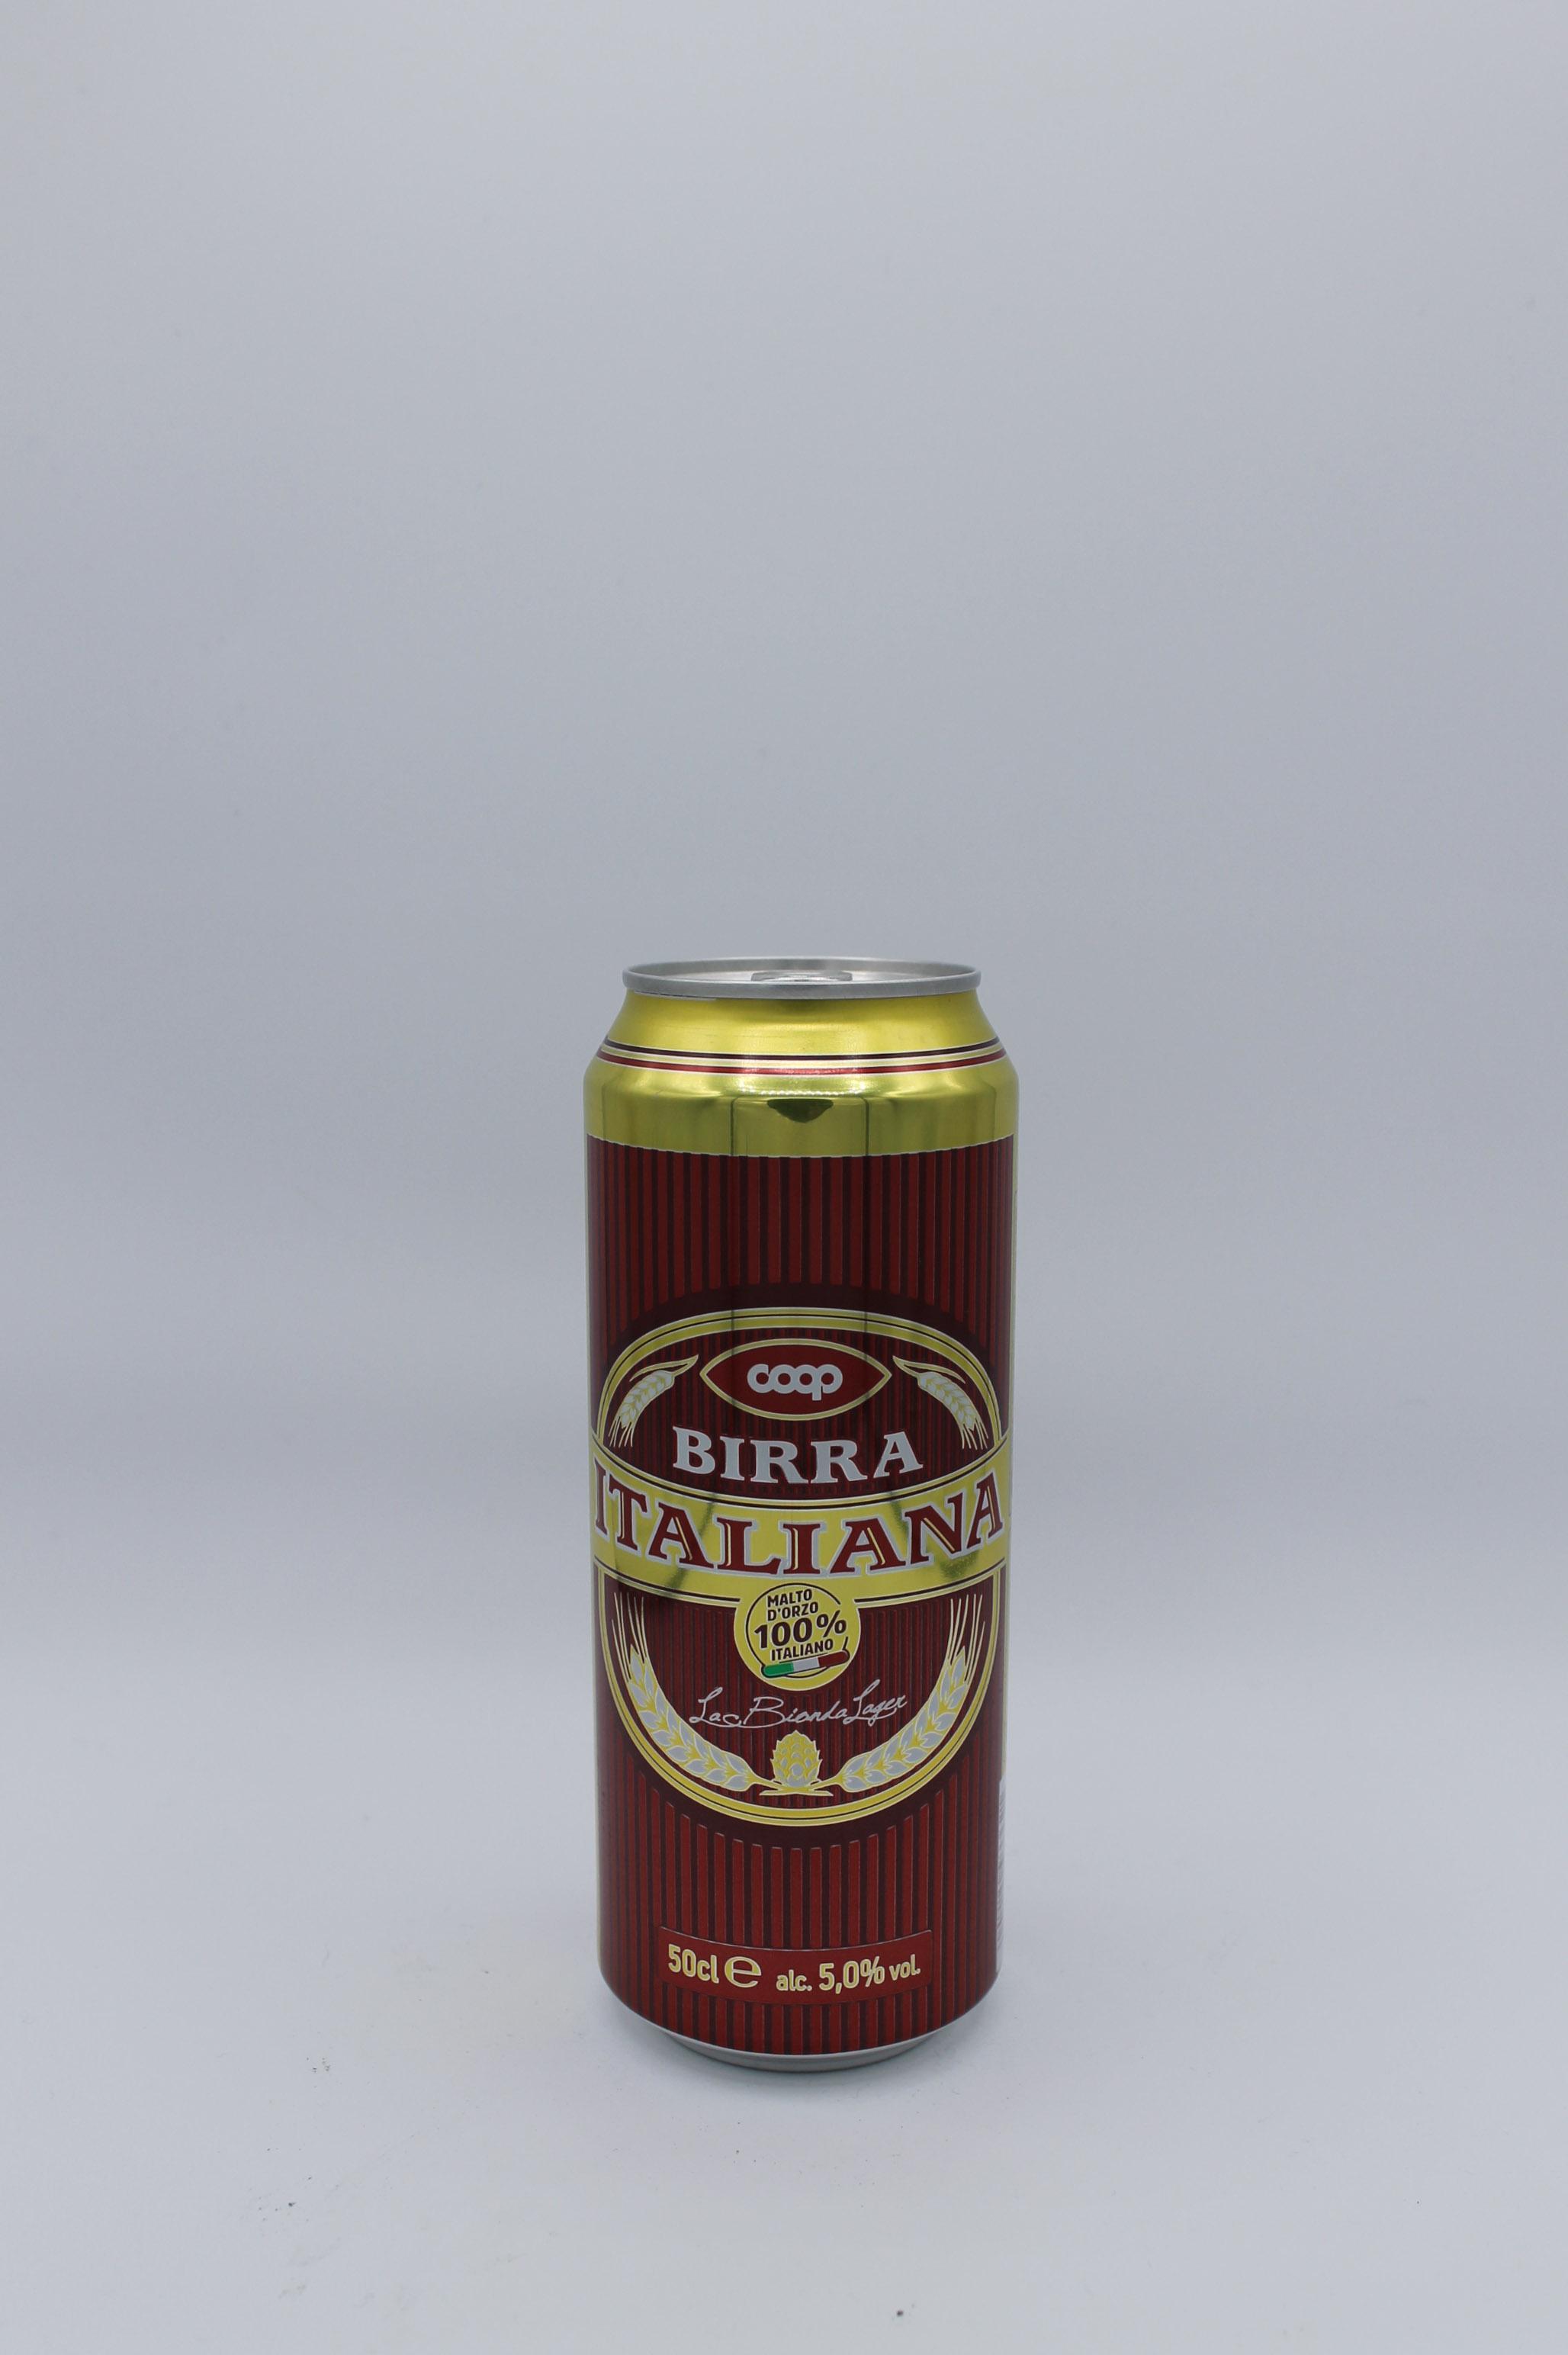 Coop birra lattina 500ml.